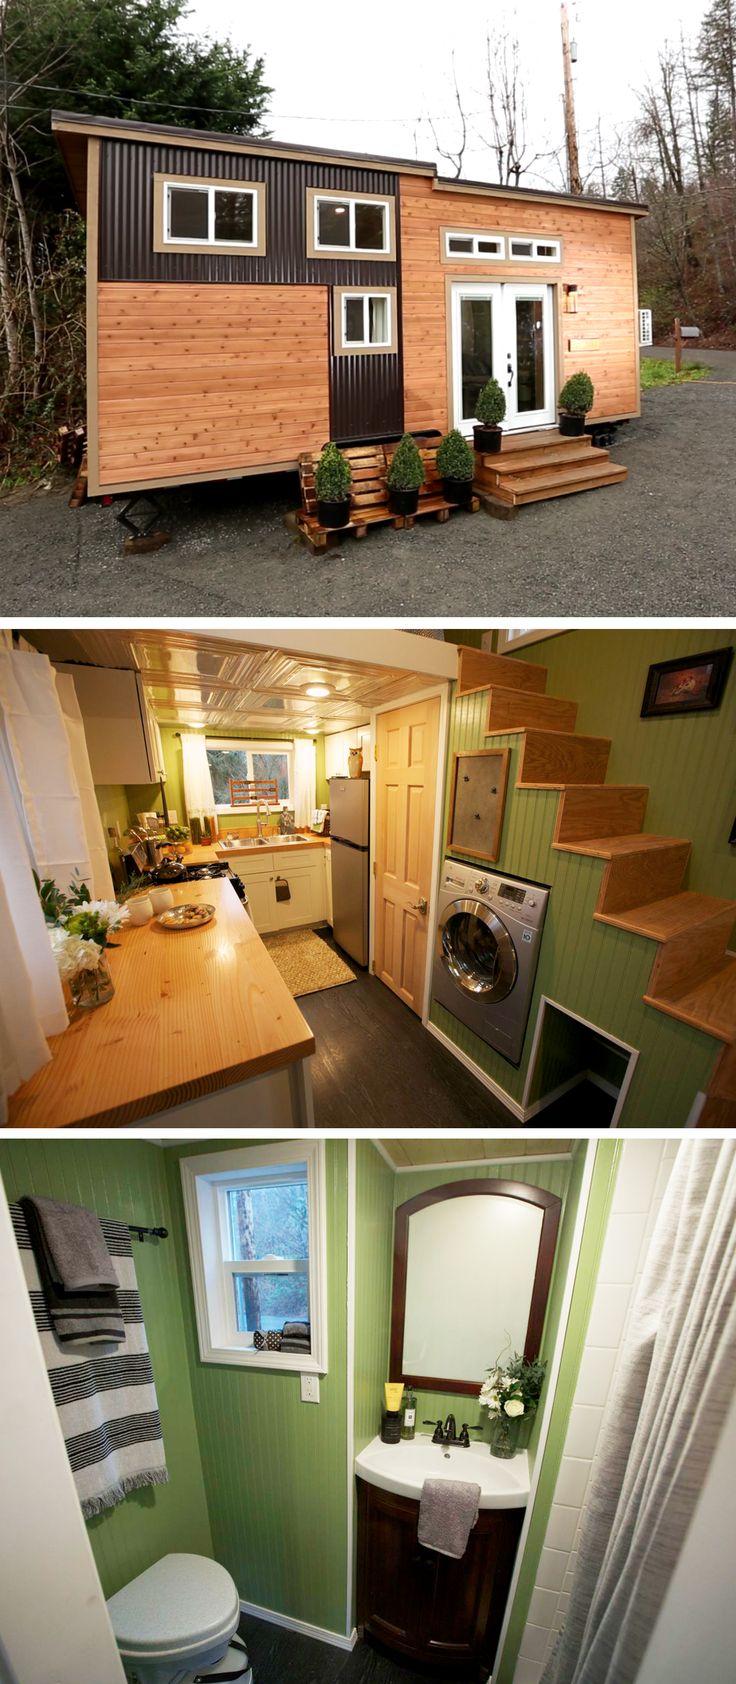 eae3fad3e3cde8774dfce0e73b03acd2  tx usa tiny homes - Download Small House Design Usa  Background